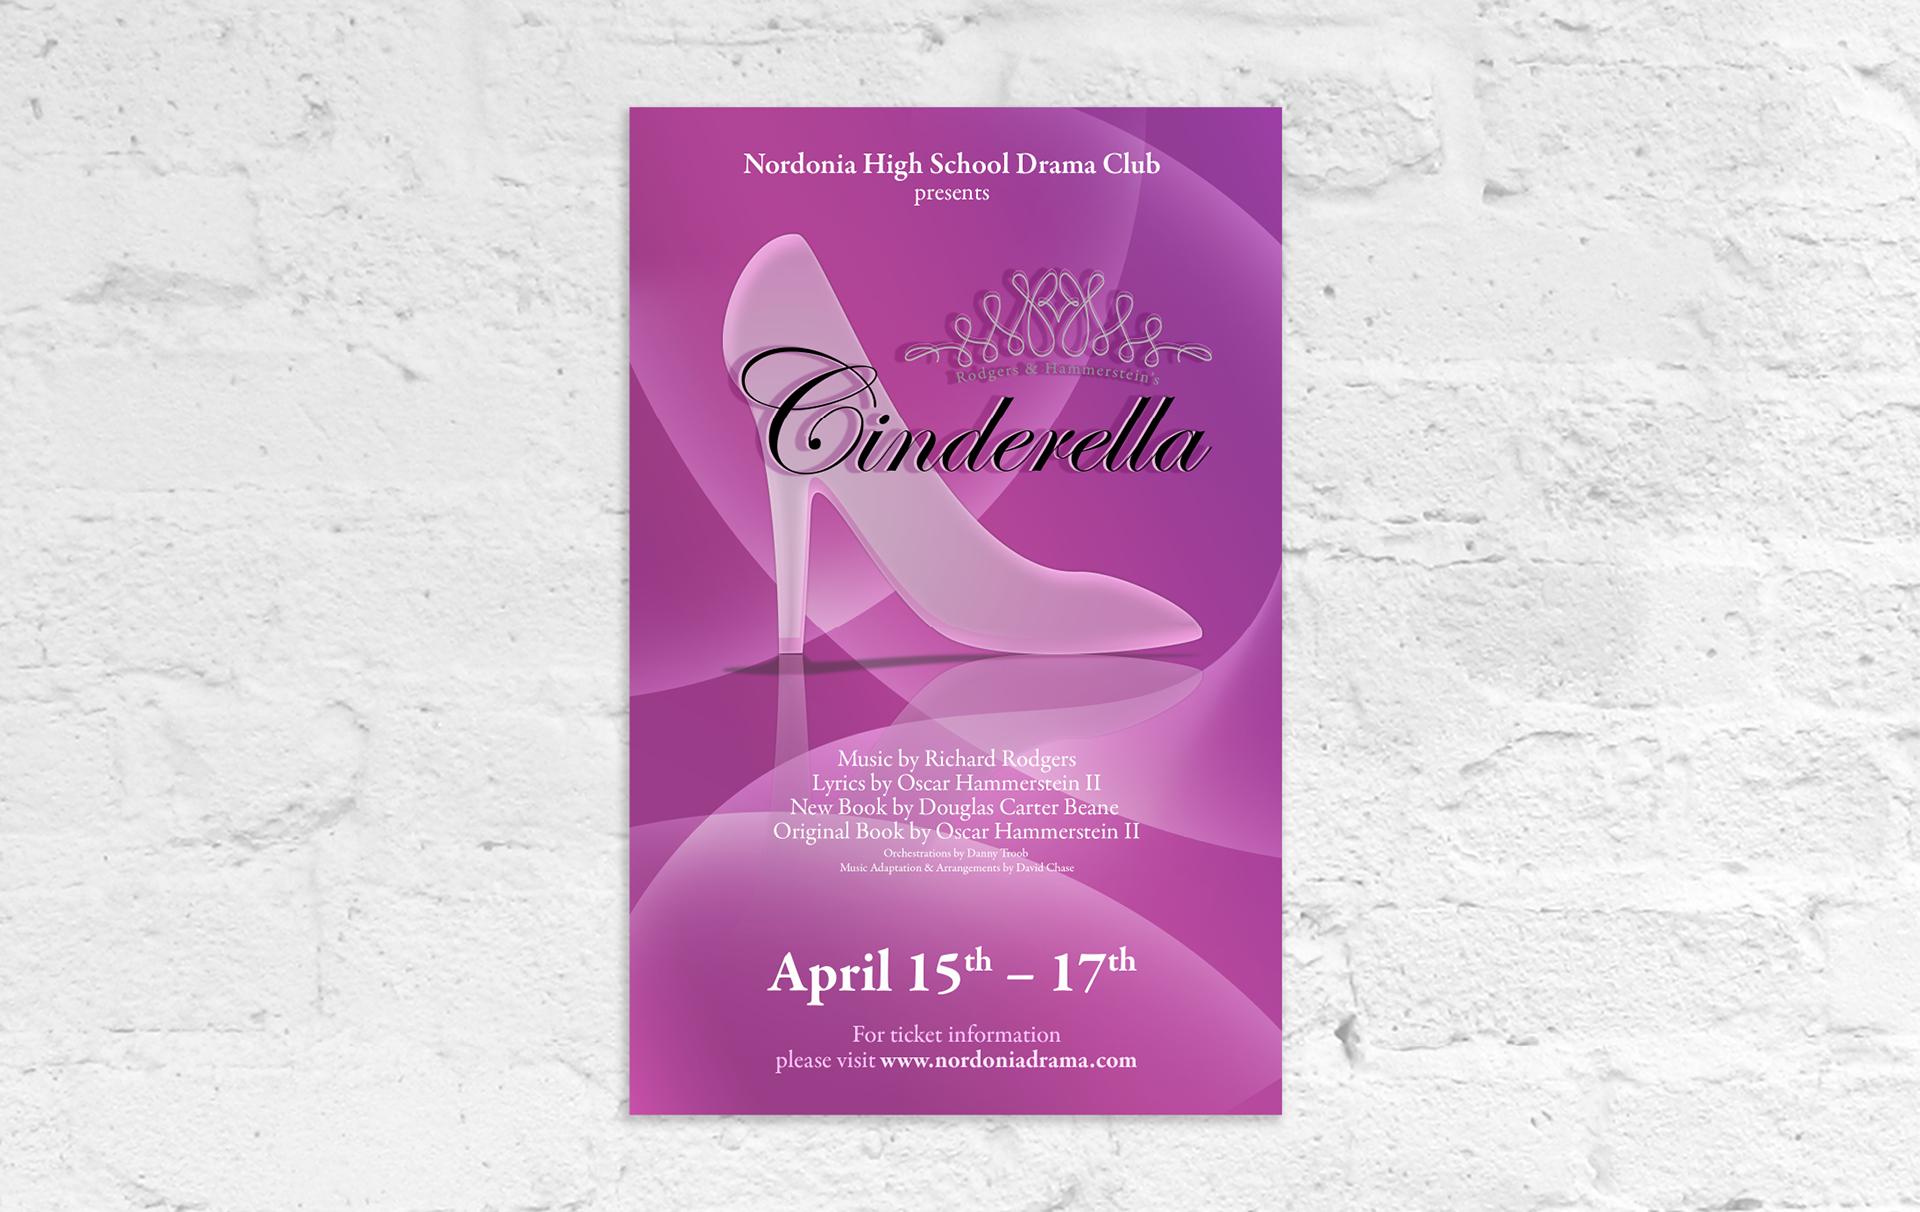 Cinderella_poster.jpg